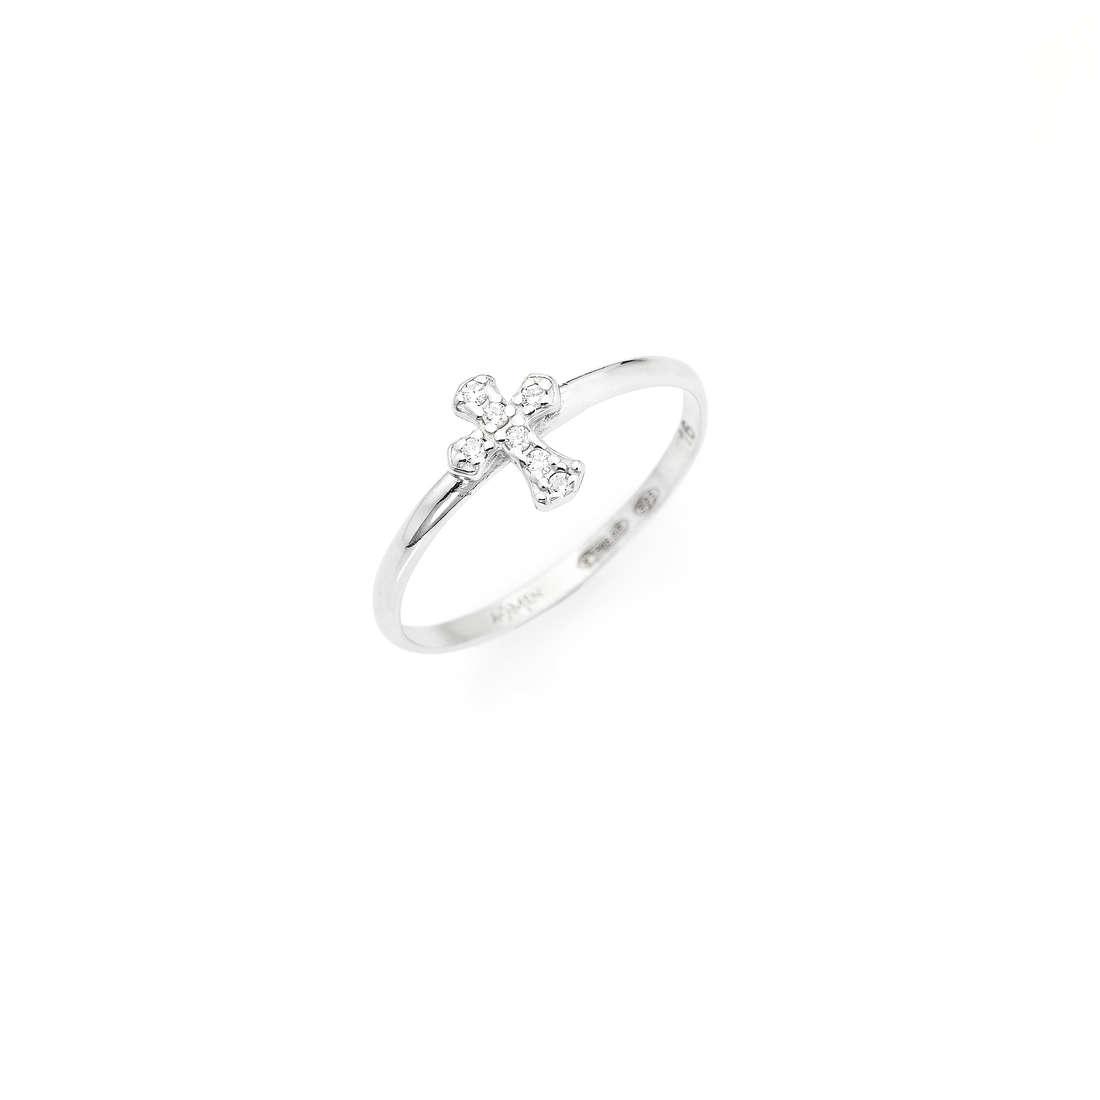 ring unisex jewellery Amen Prega, Ama ACZB-12